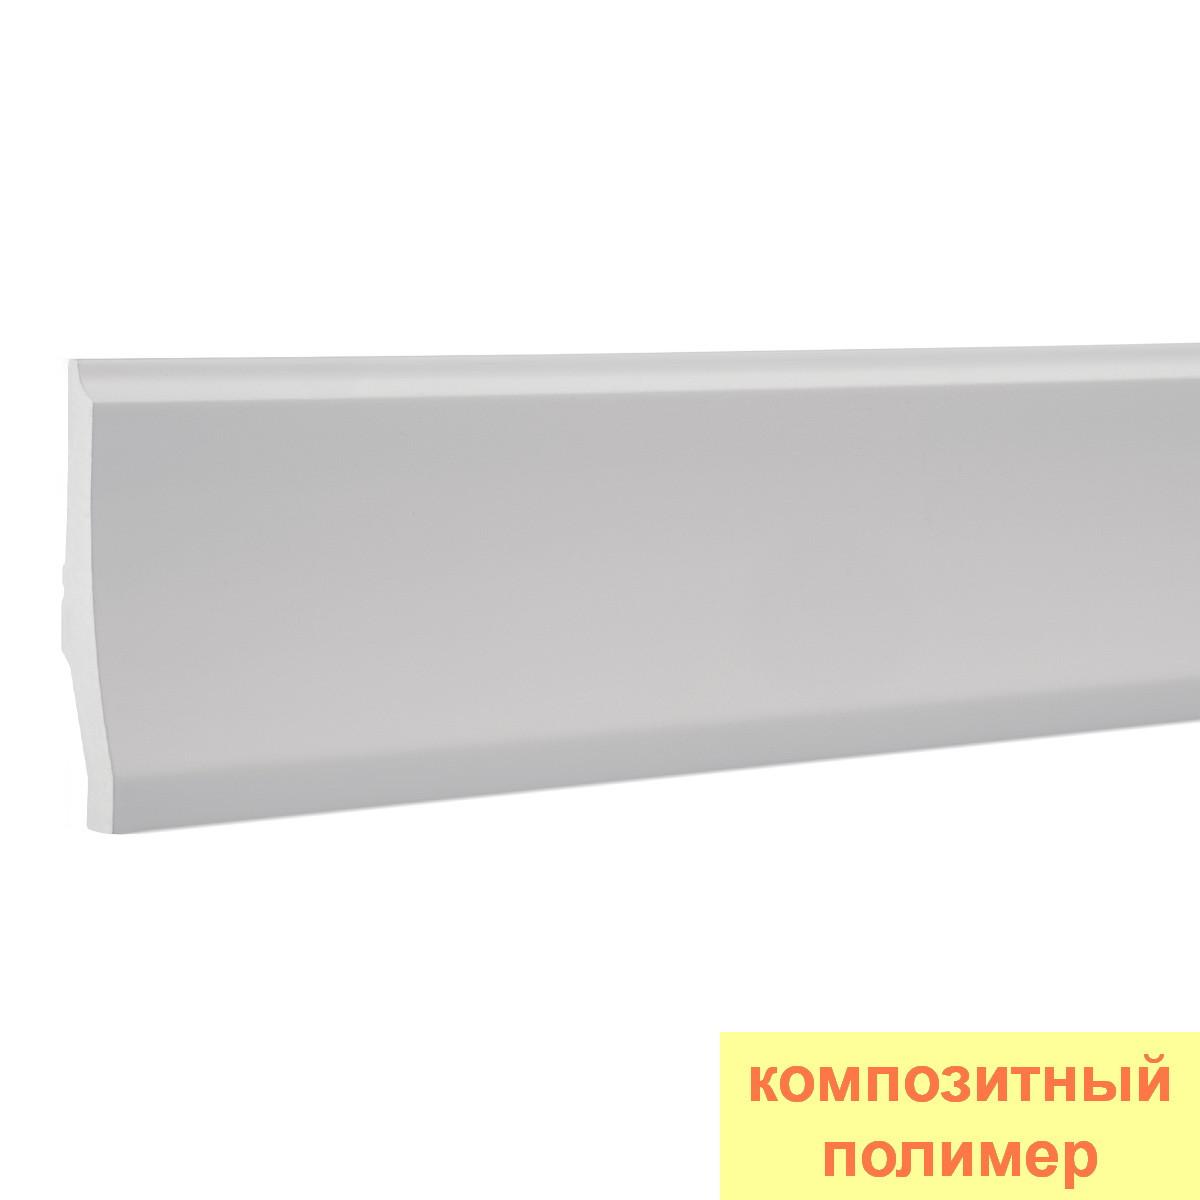 Плинтус Европласт 6.53.104 (120х25)мм